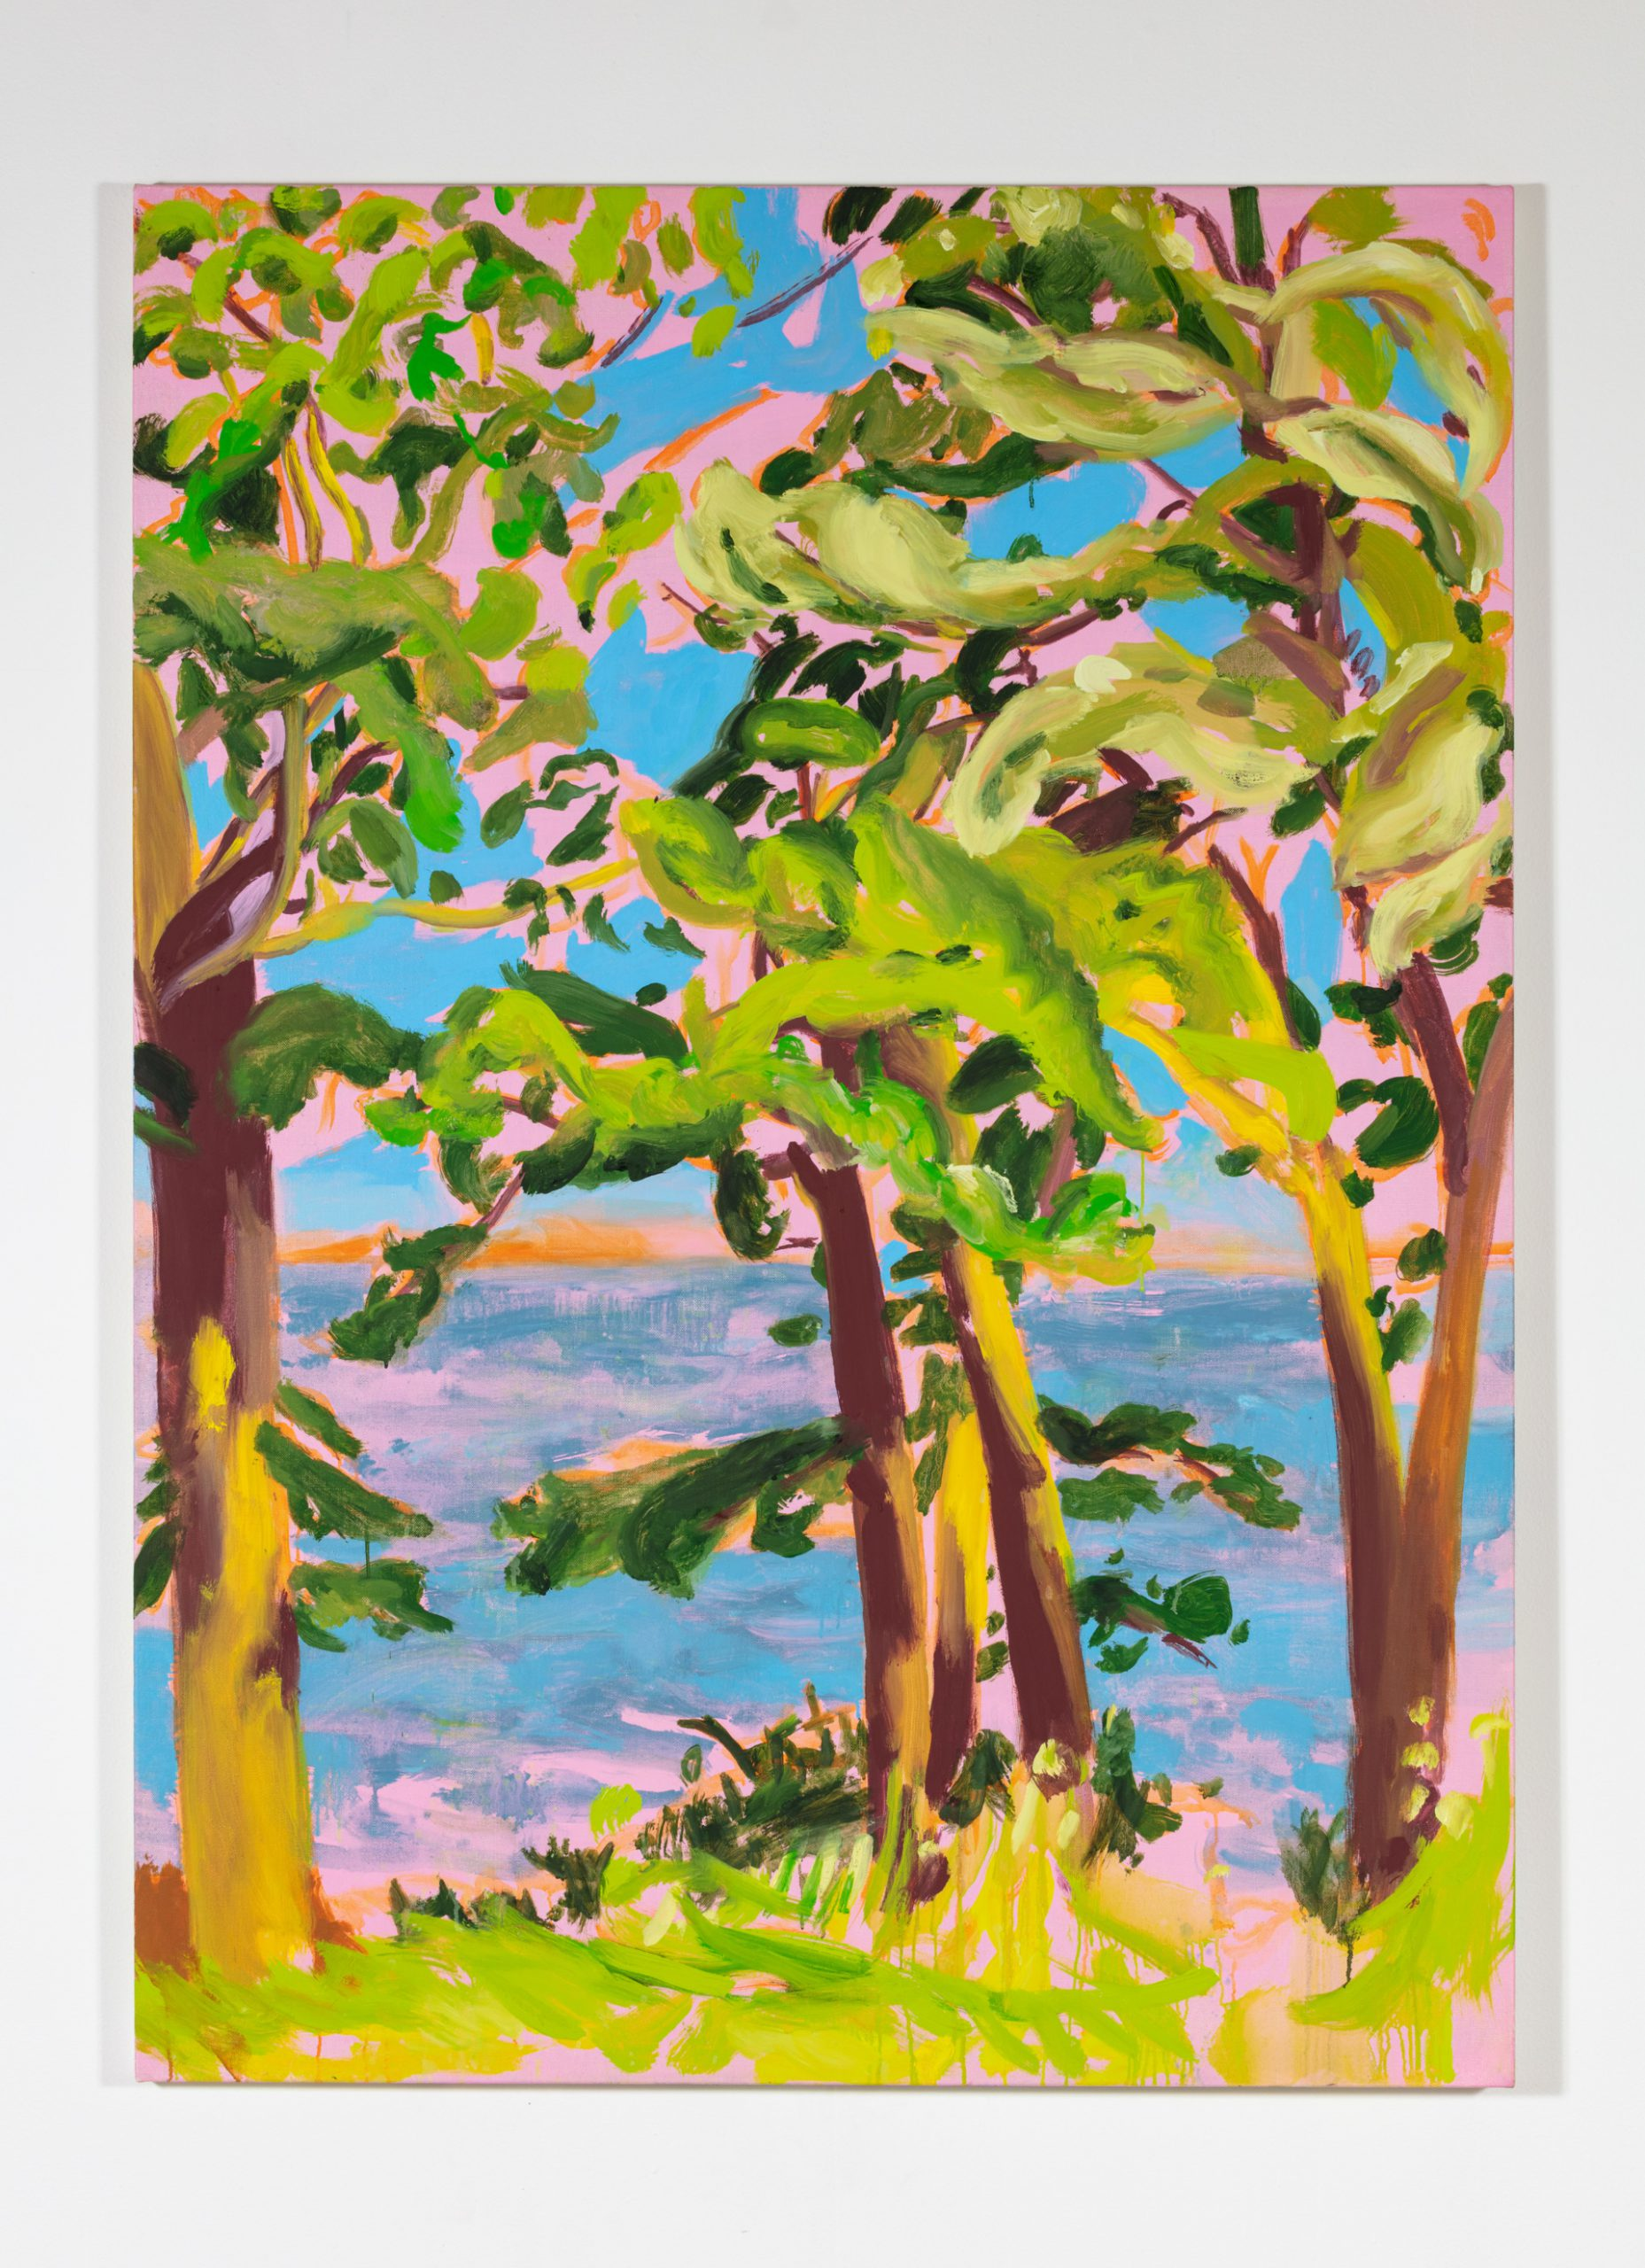 Nicole Wittenberg, Breezes, 2020, Oil on canvas, 66 x 48 in.